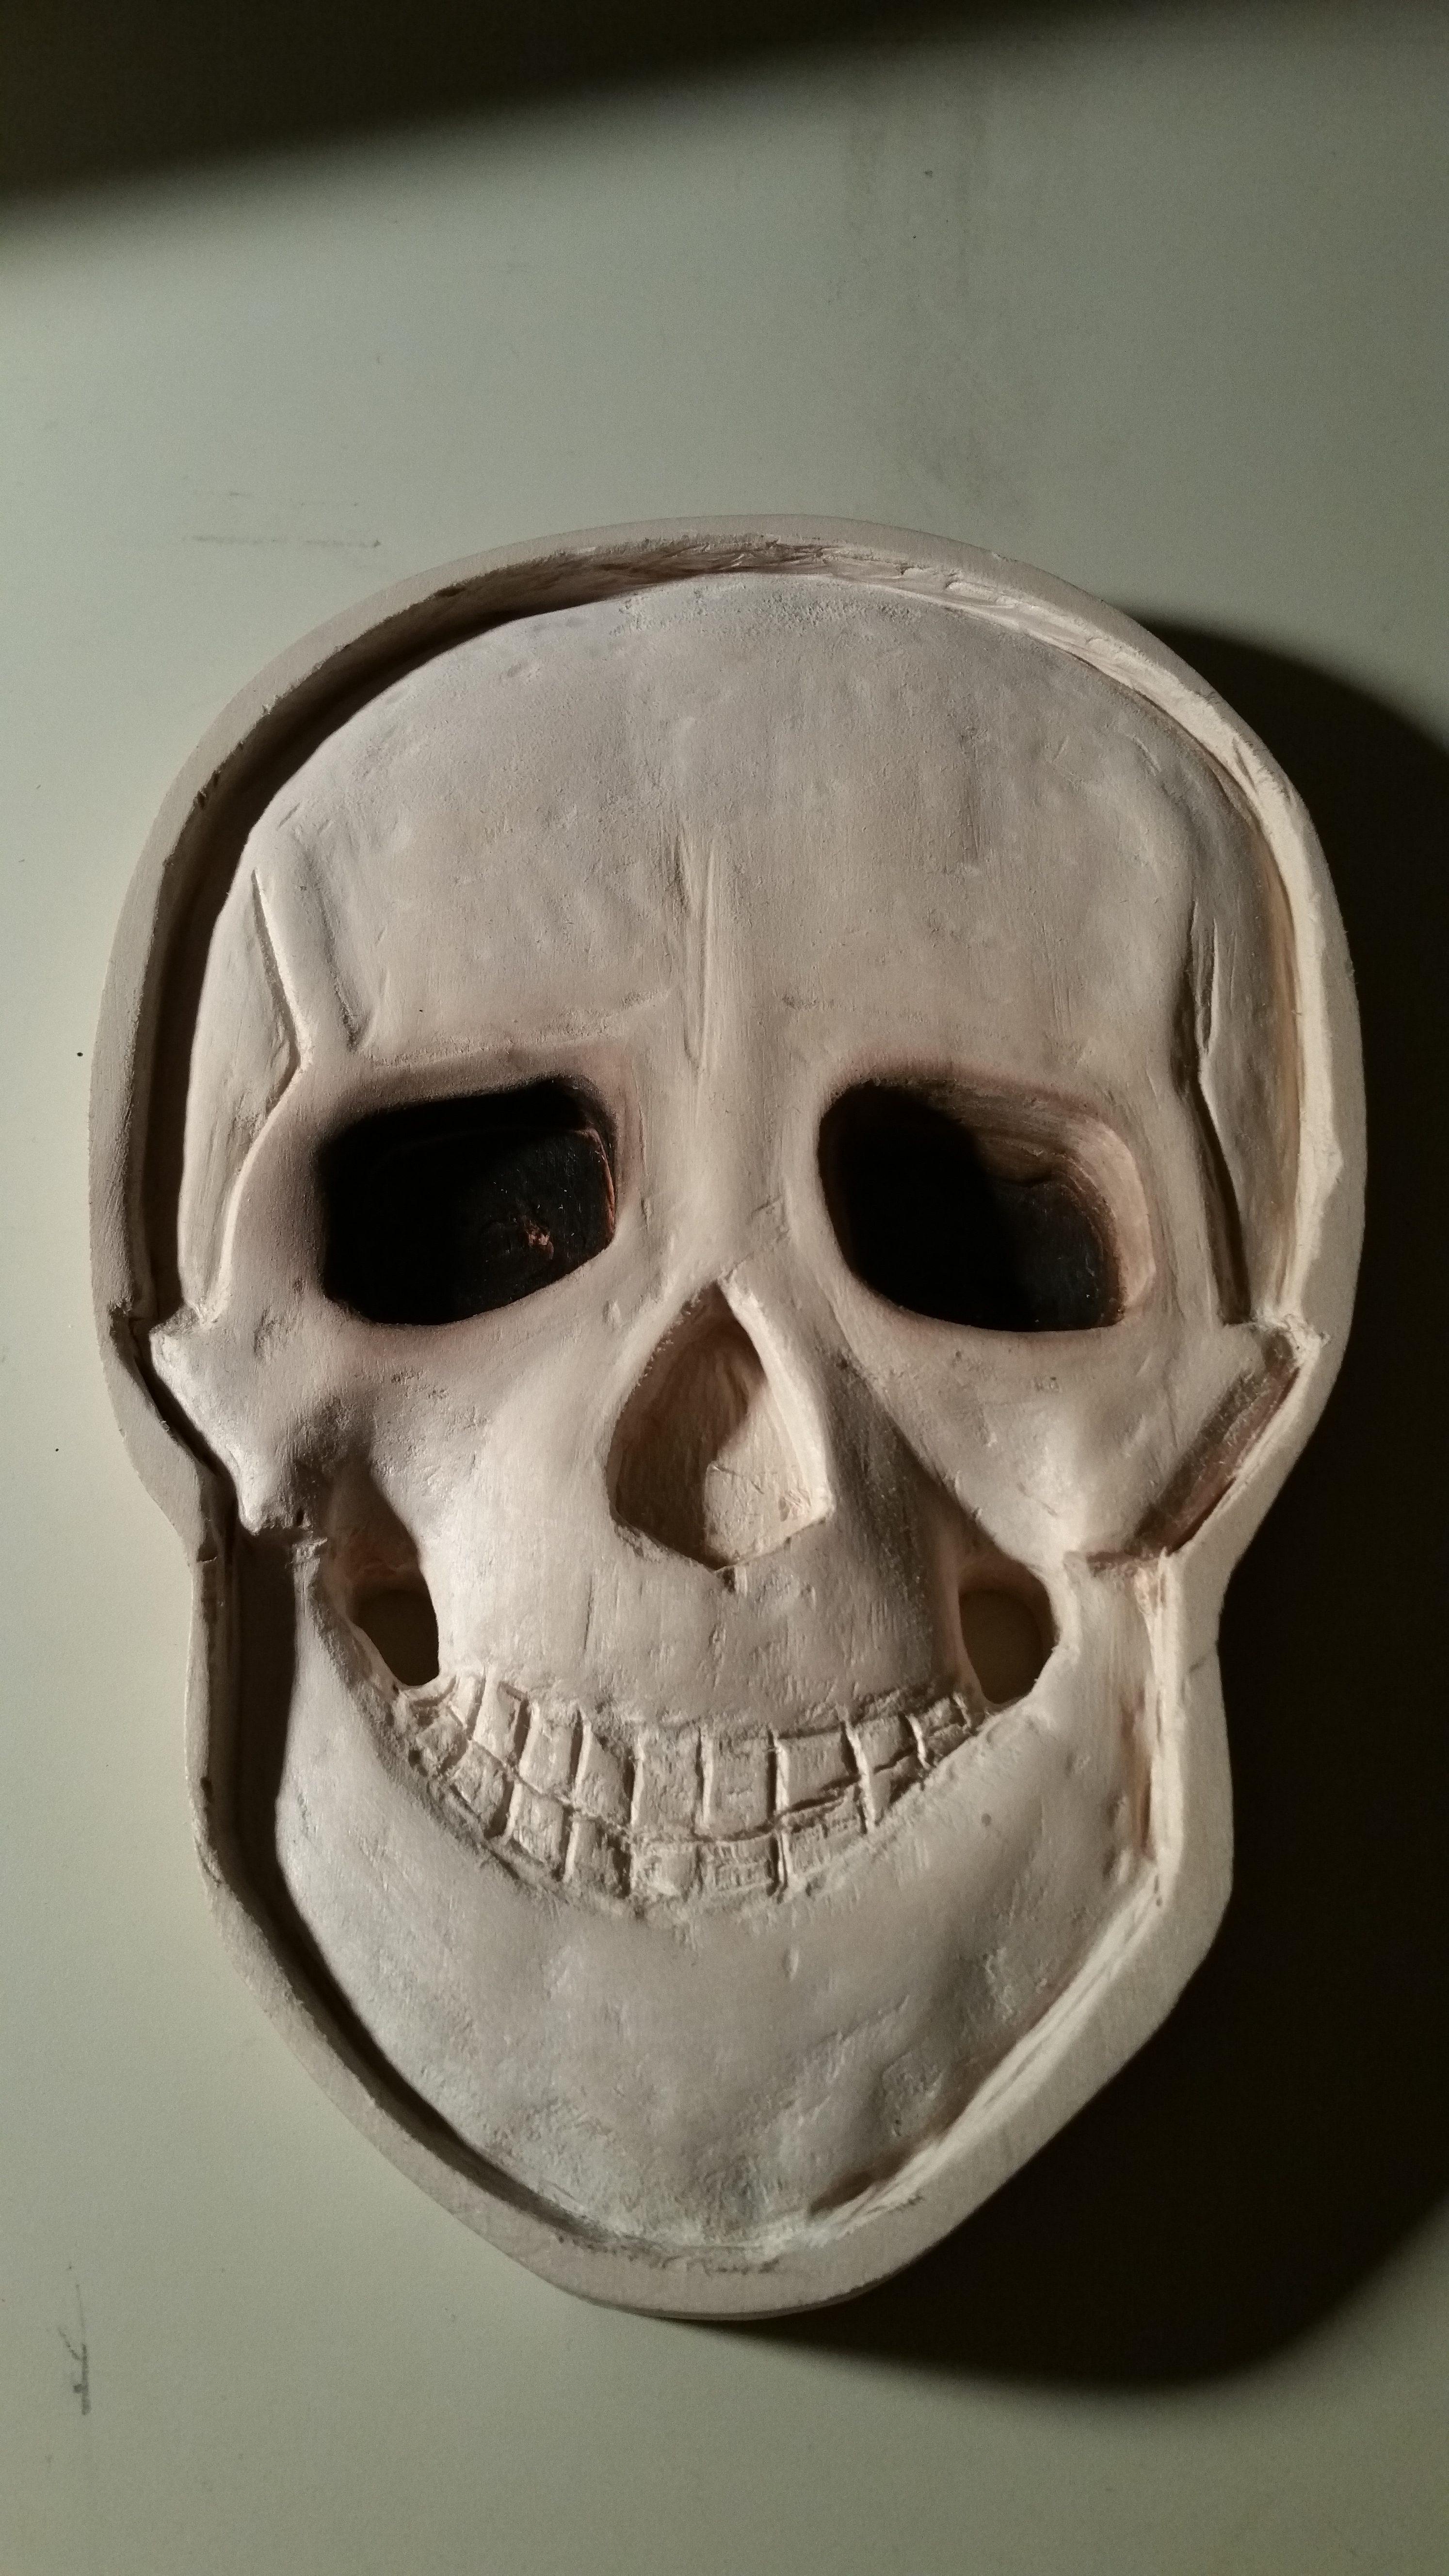 custom carving, custom engraving, skull sculpture, 3D skull test